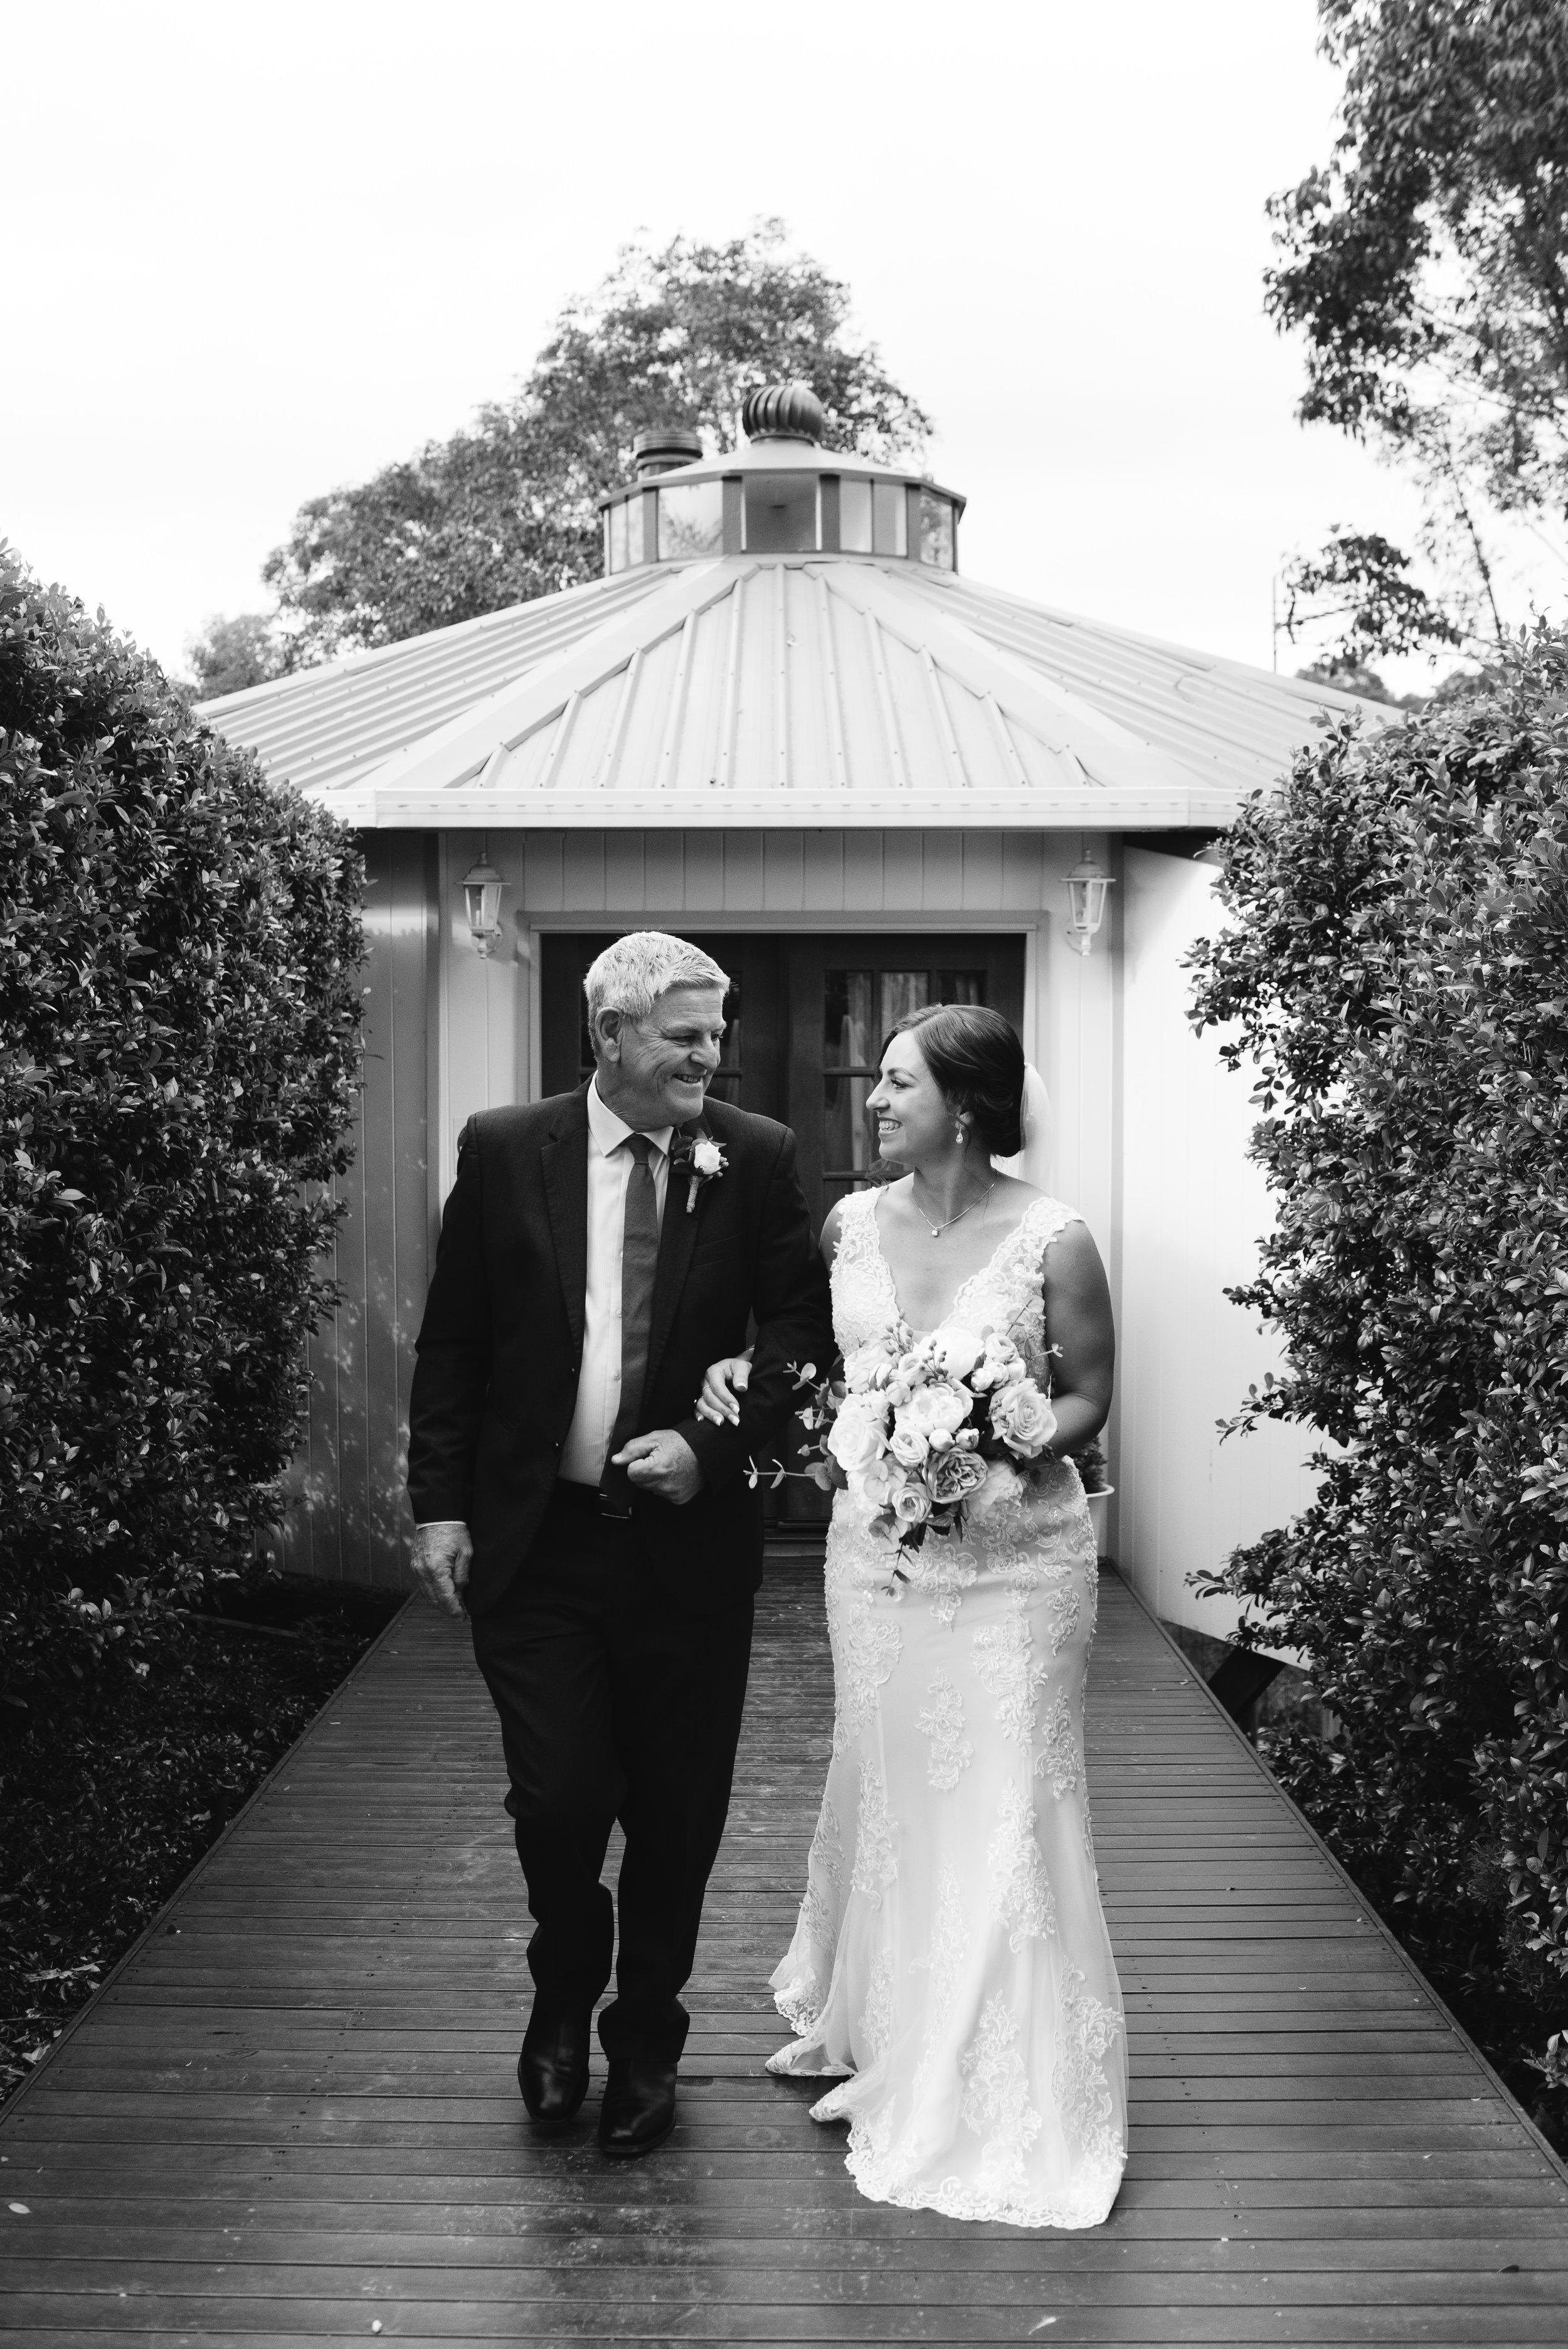 LAURENOLIVIA-austinvilla-estate-wedding-17.jpg